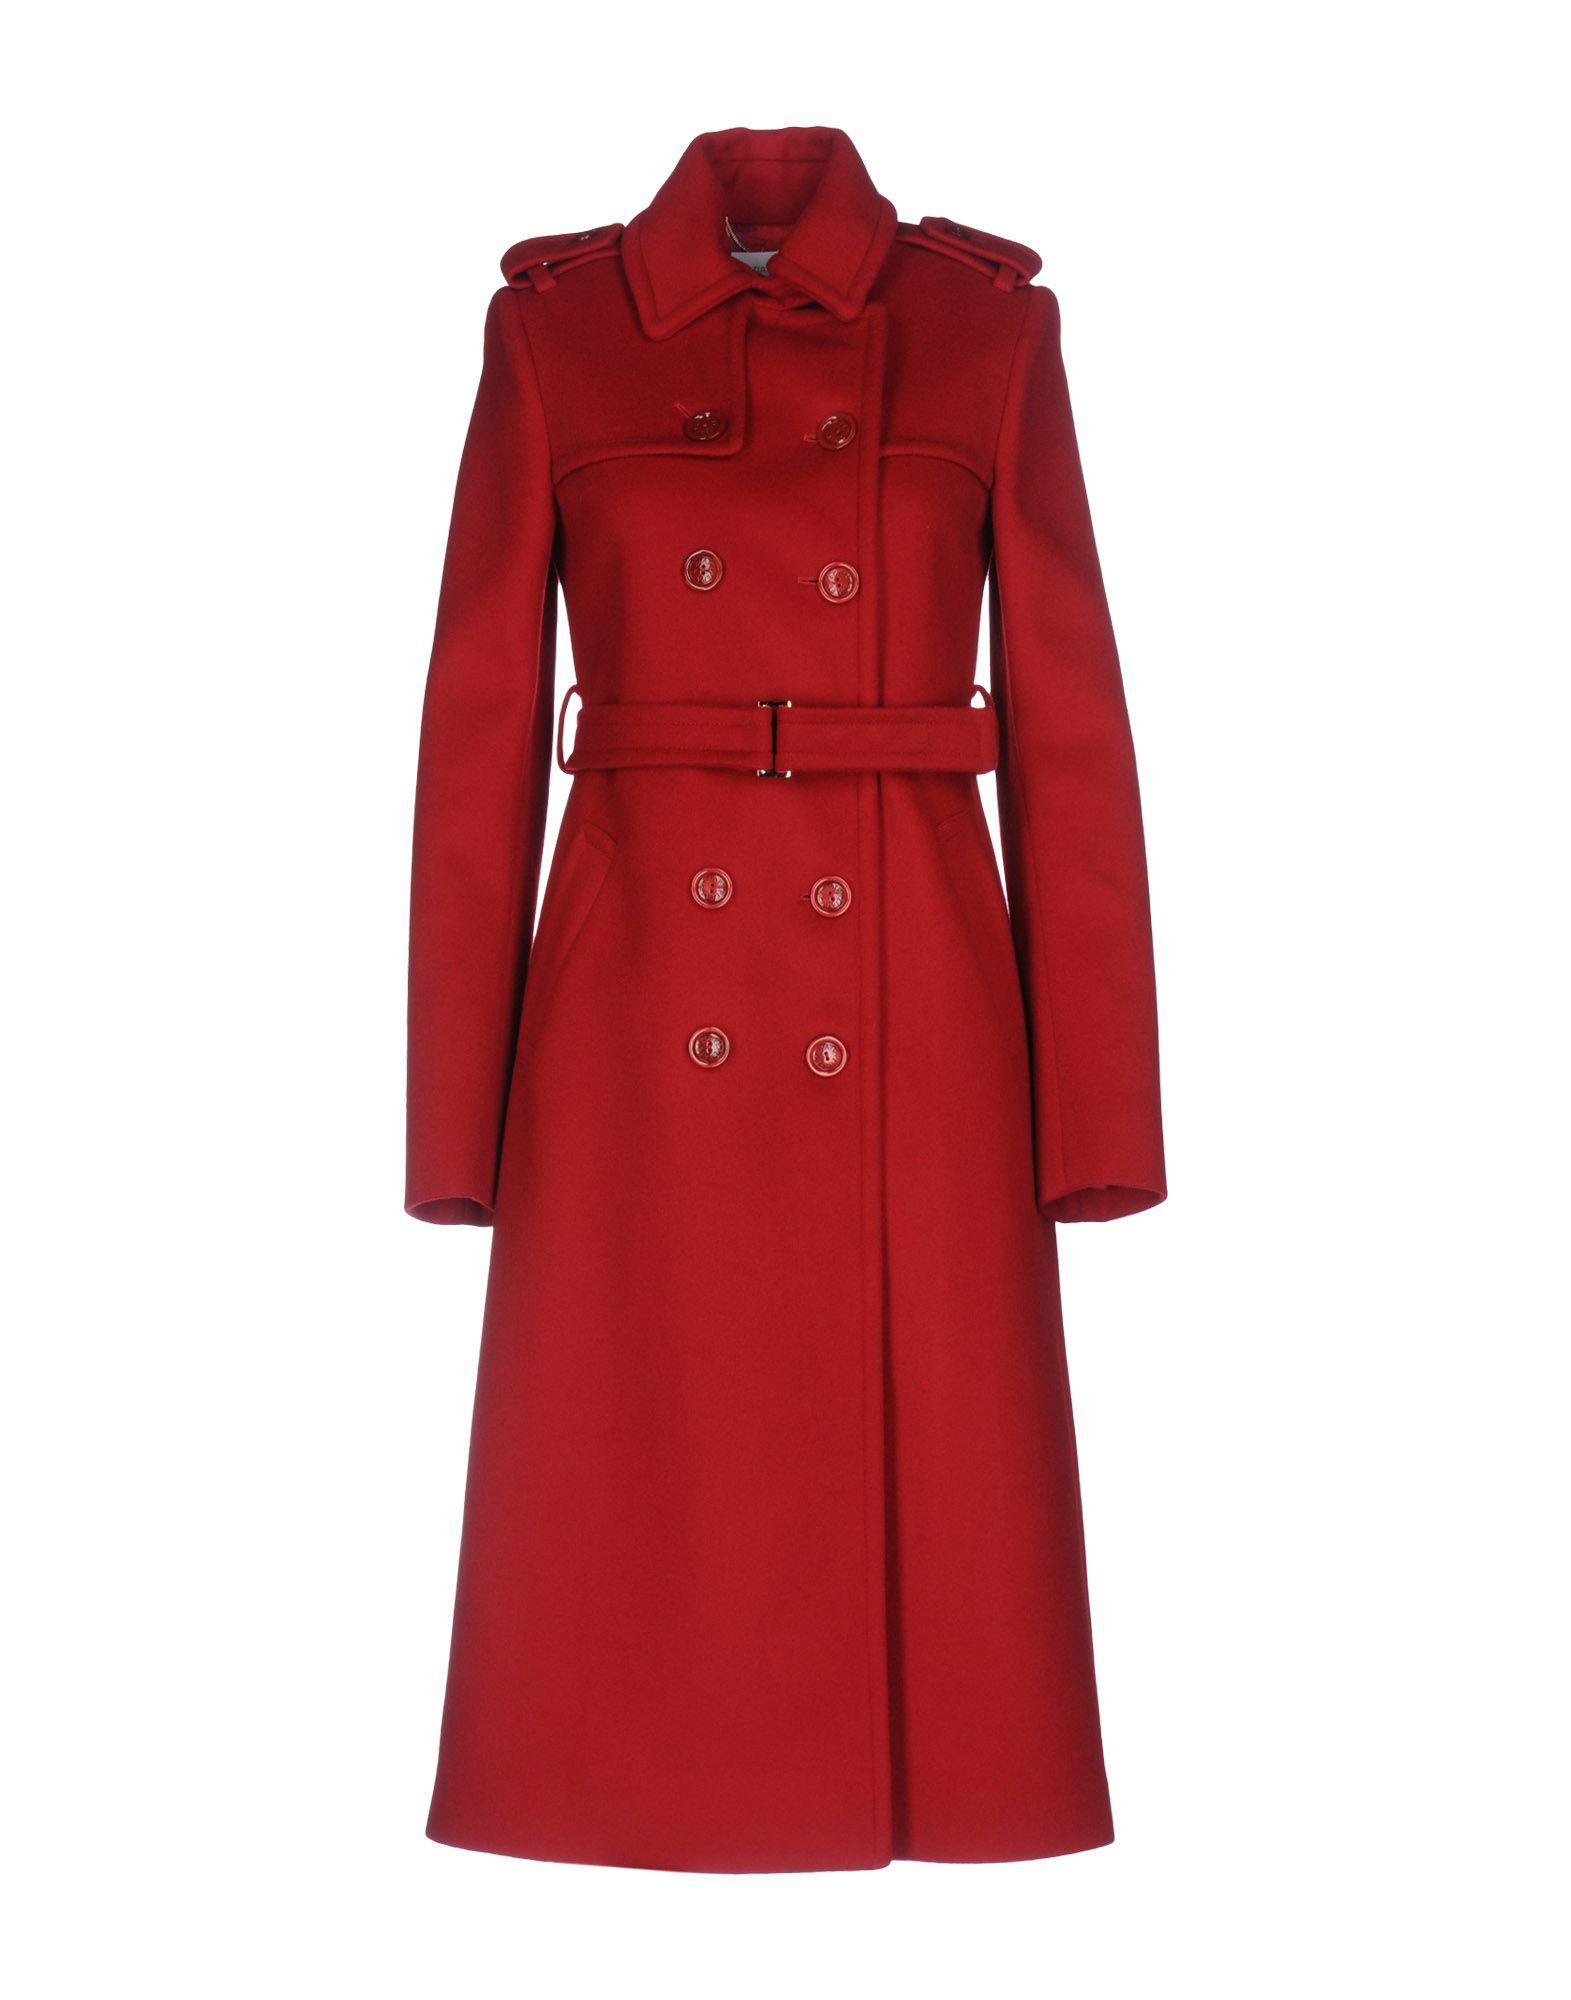 Patrizia Pepe Coats In Red